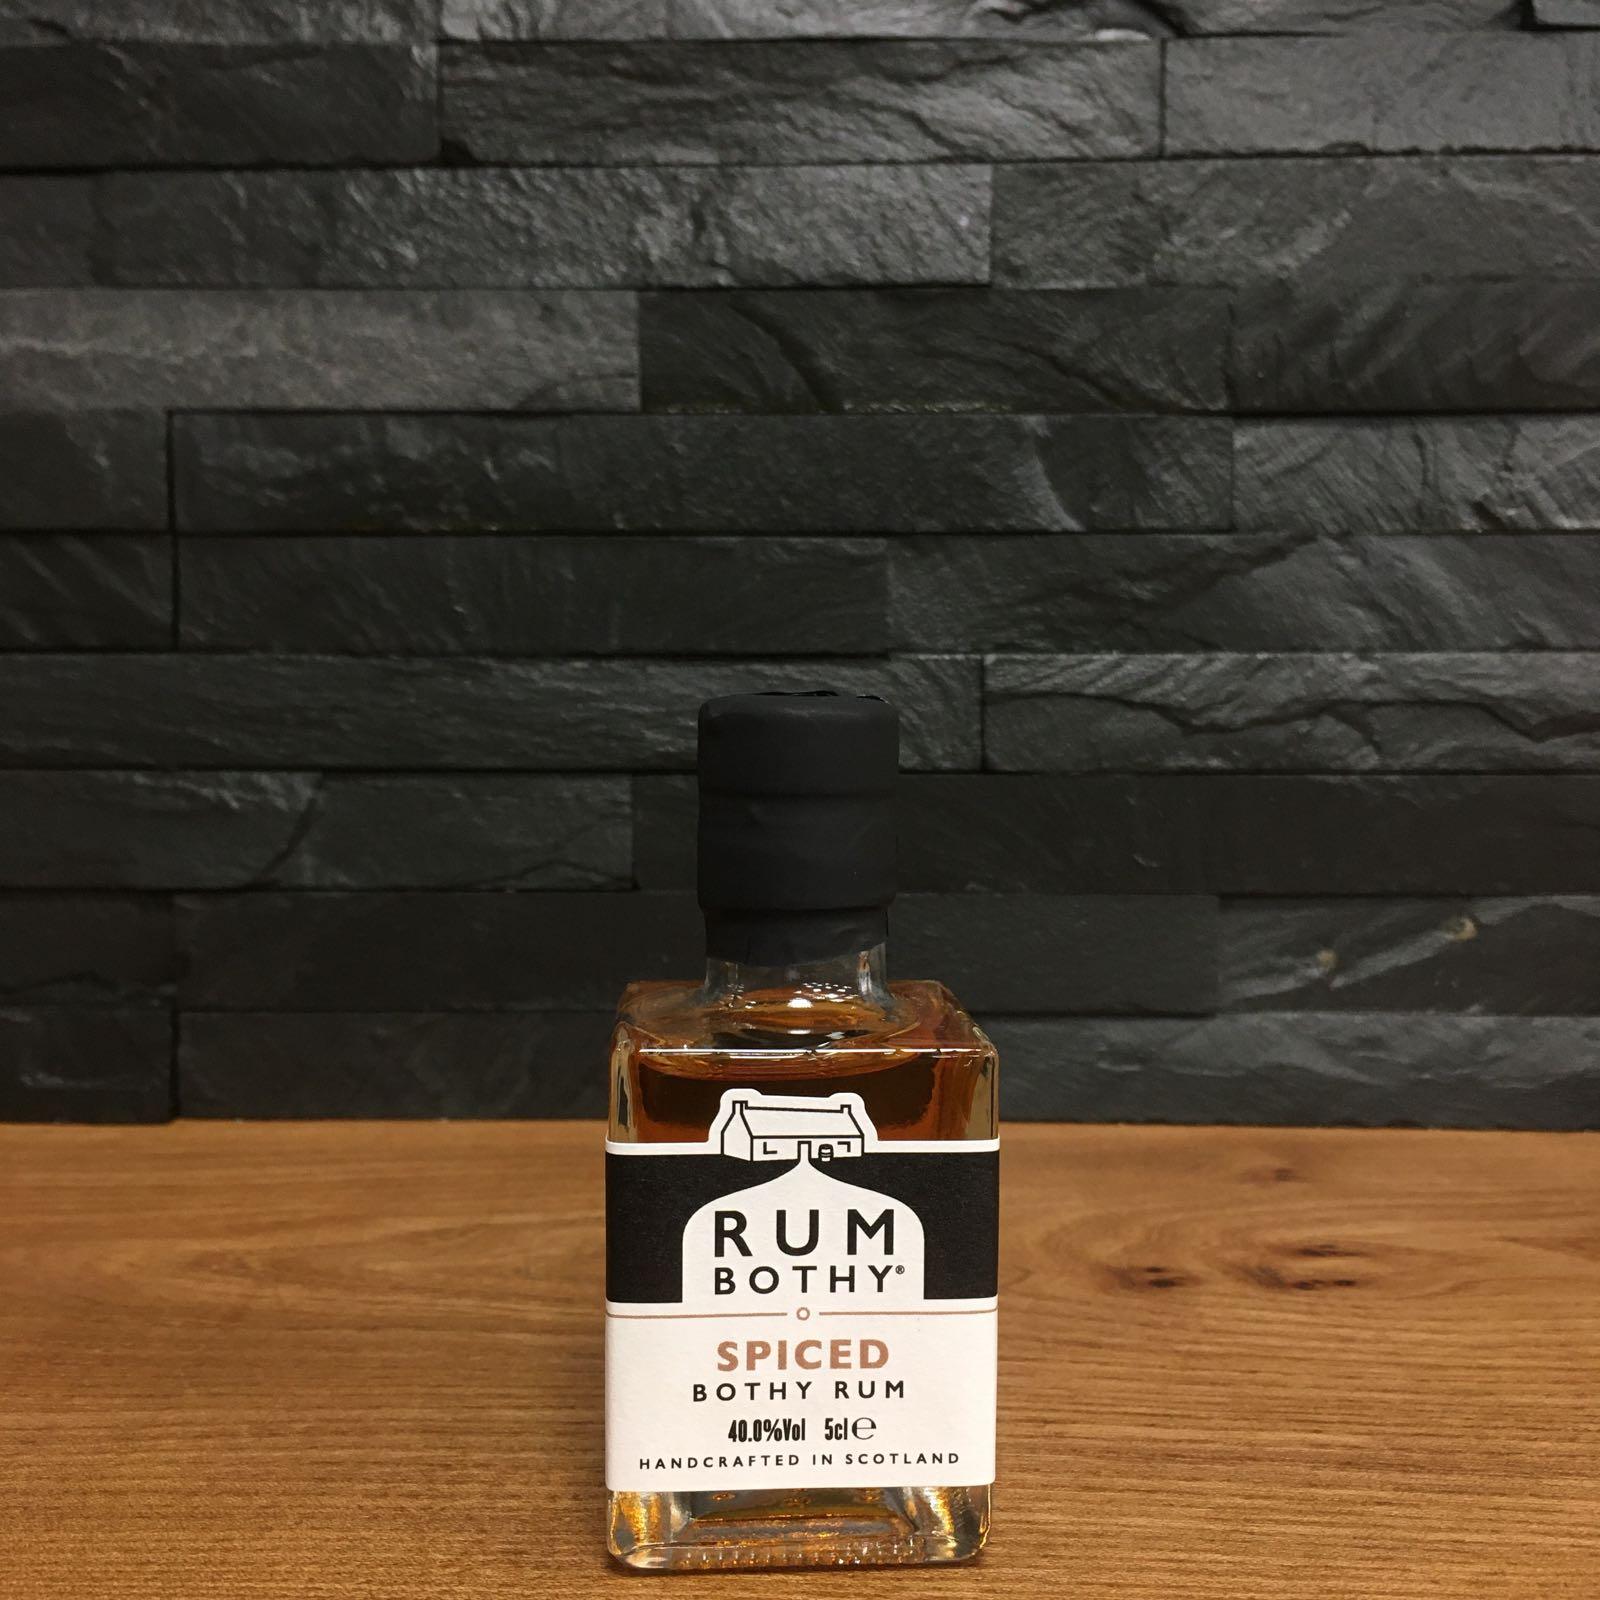 Rum Bothy Spiced Rum 5cl